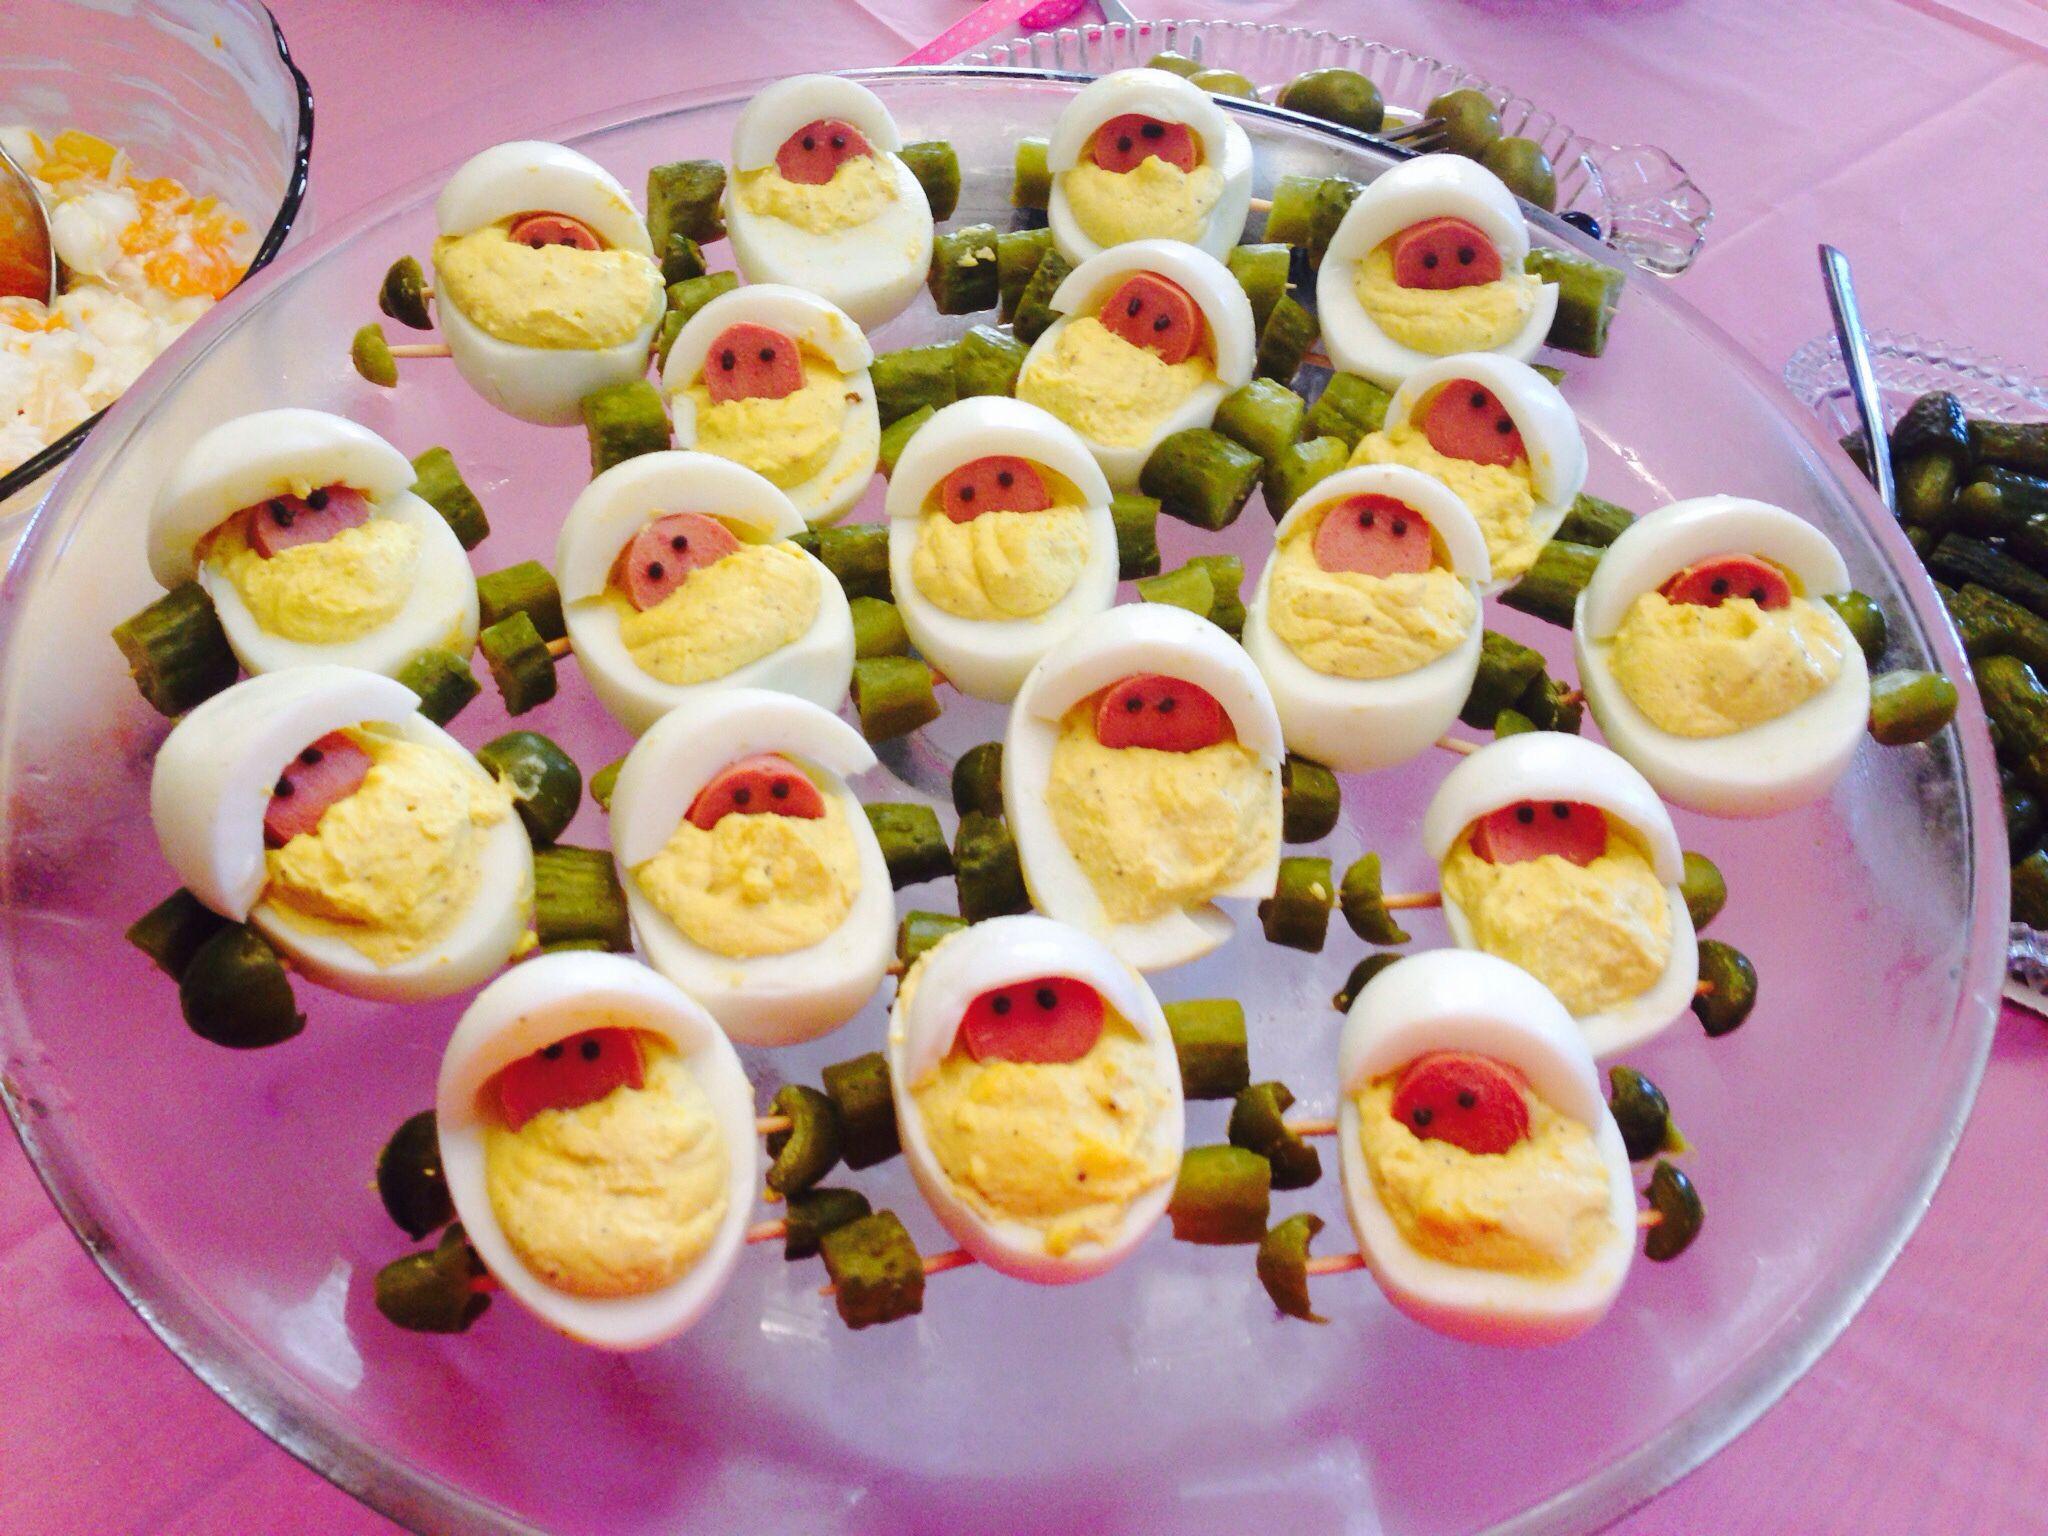 Baby Shower Deviled Eggs  Baby Carriage Deviled Eggs Ashlei Pinterest